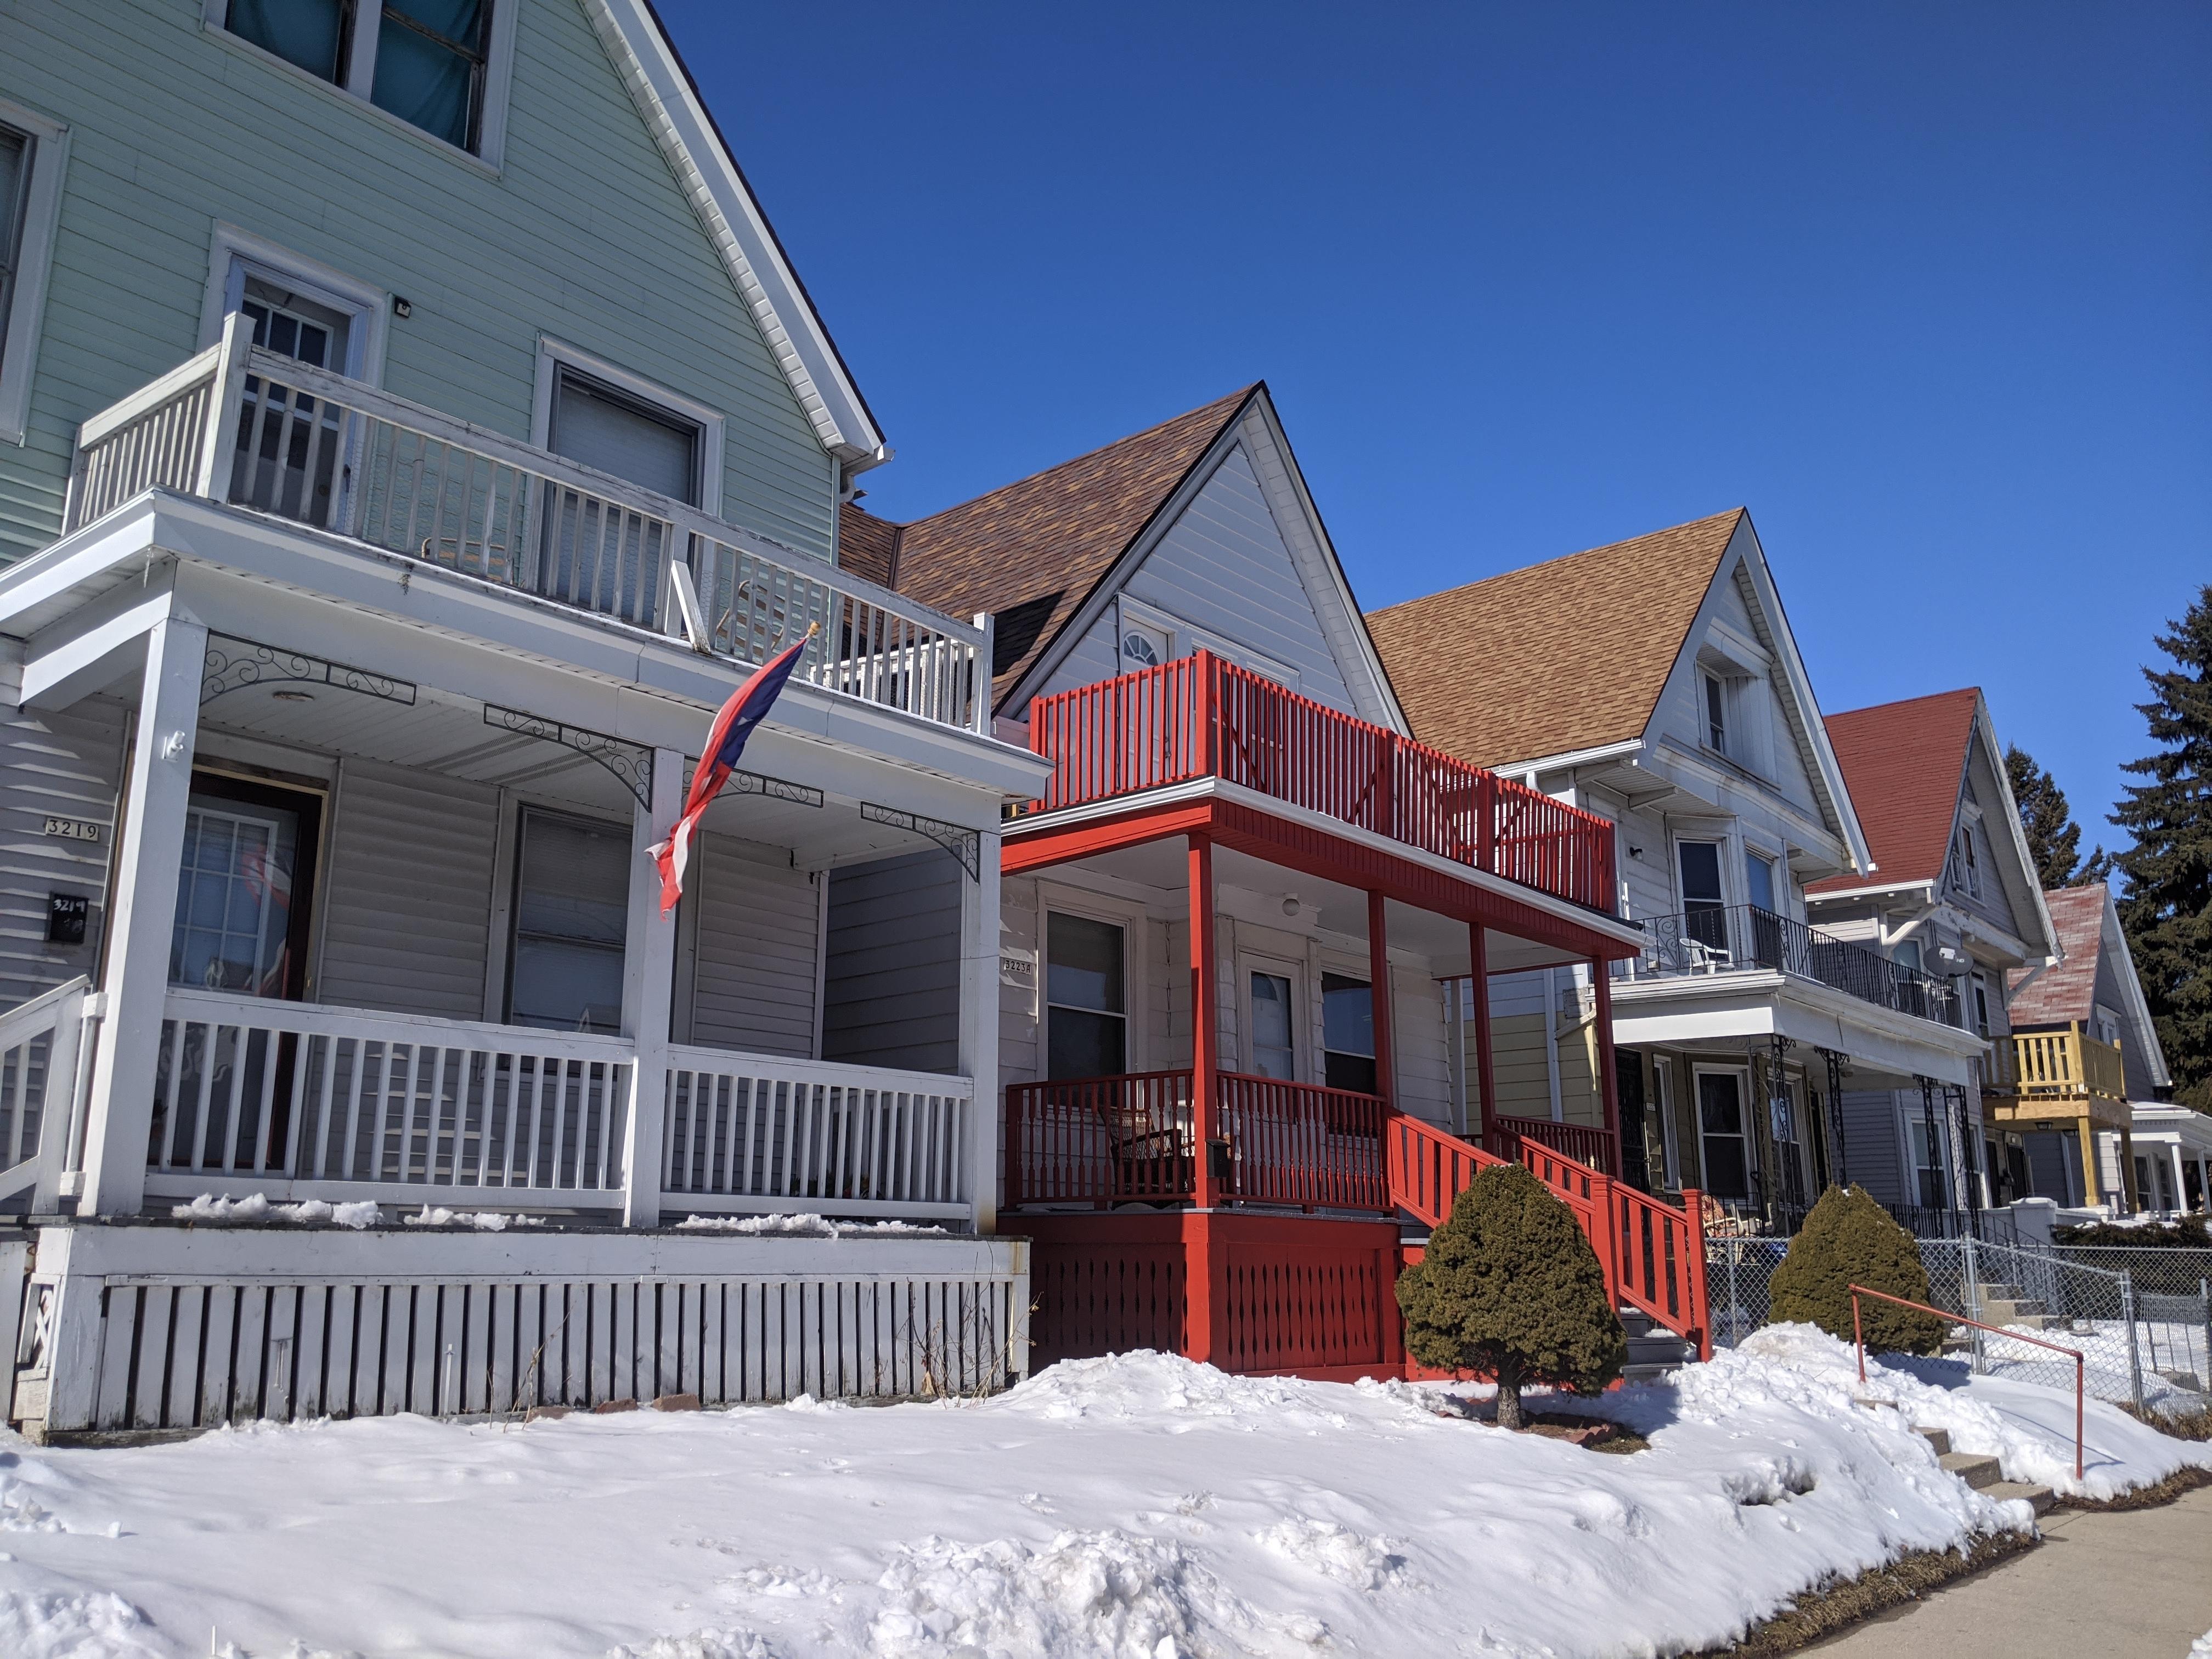 N. Holton Street homes. Photo by Carl Baehr.